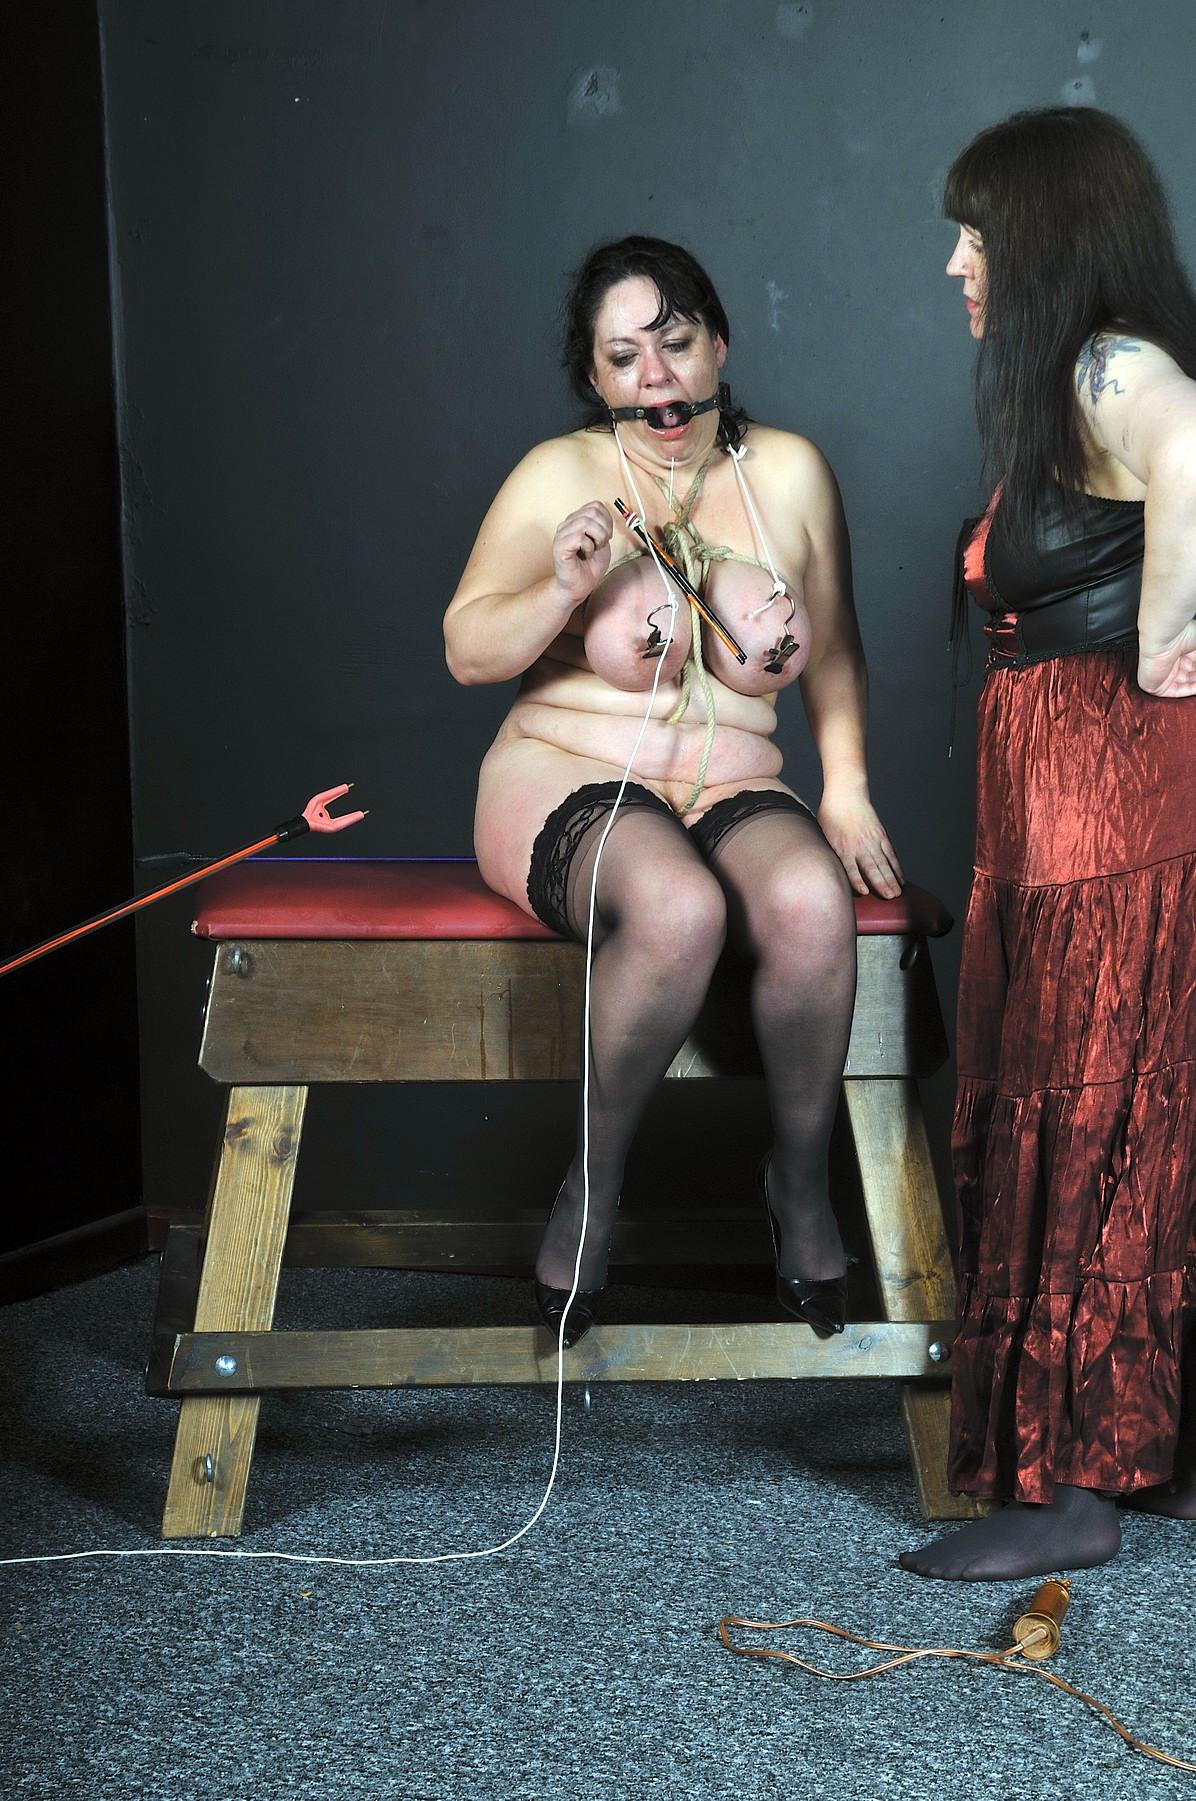 Bbw slave andreas lezdom tit torture and spanking porn photo online